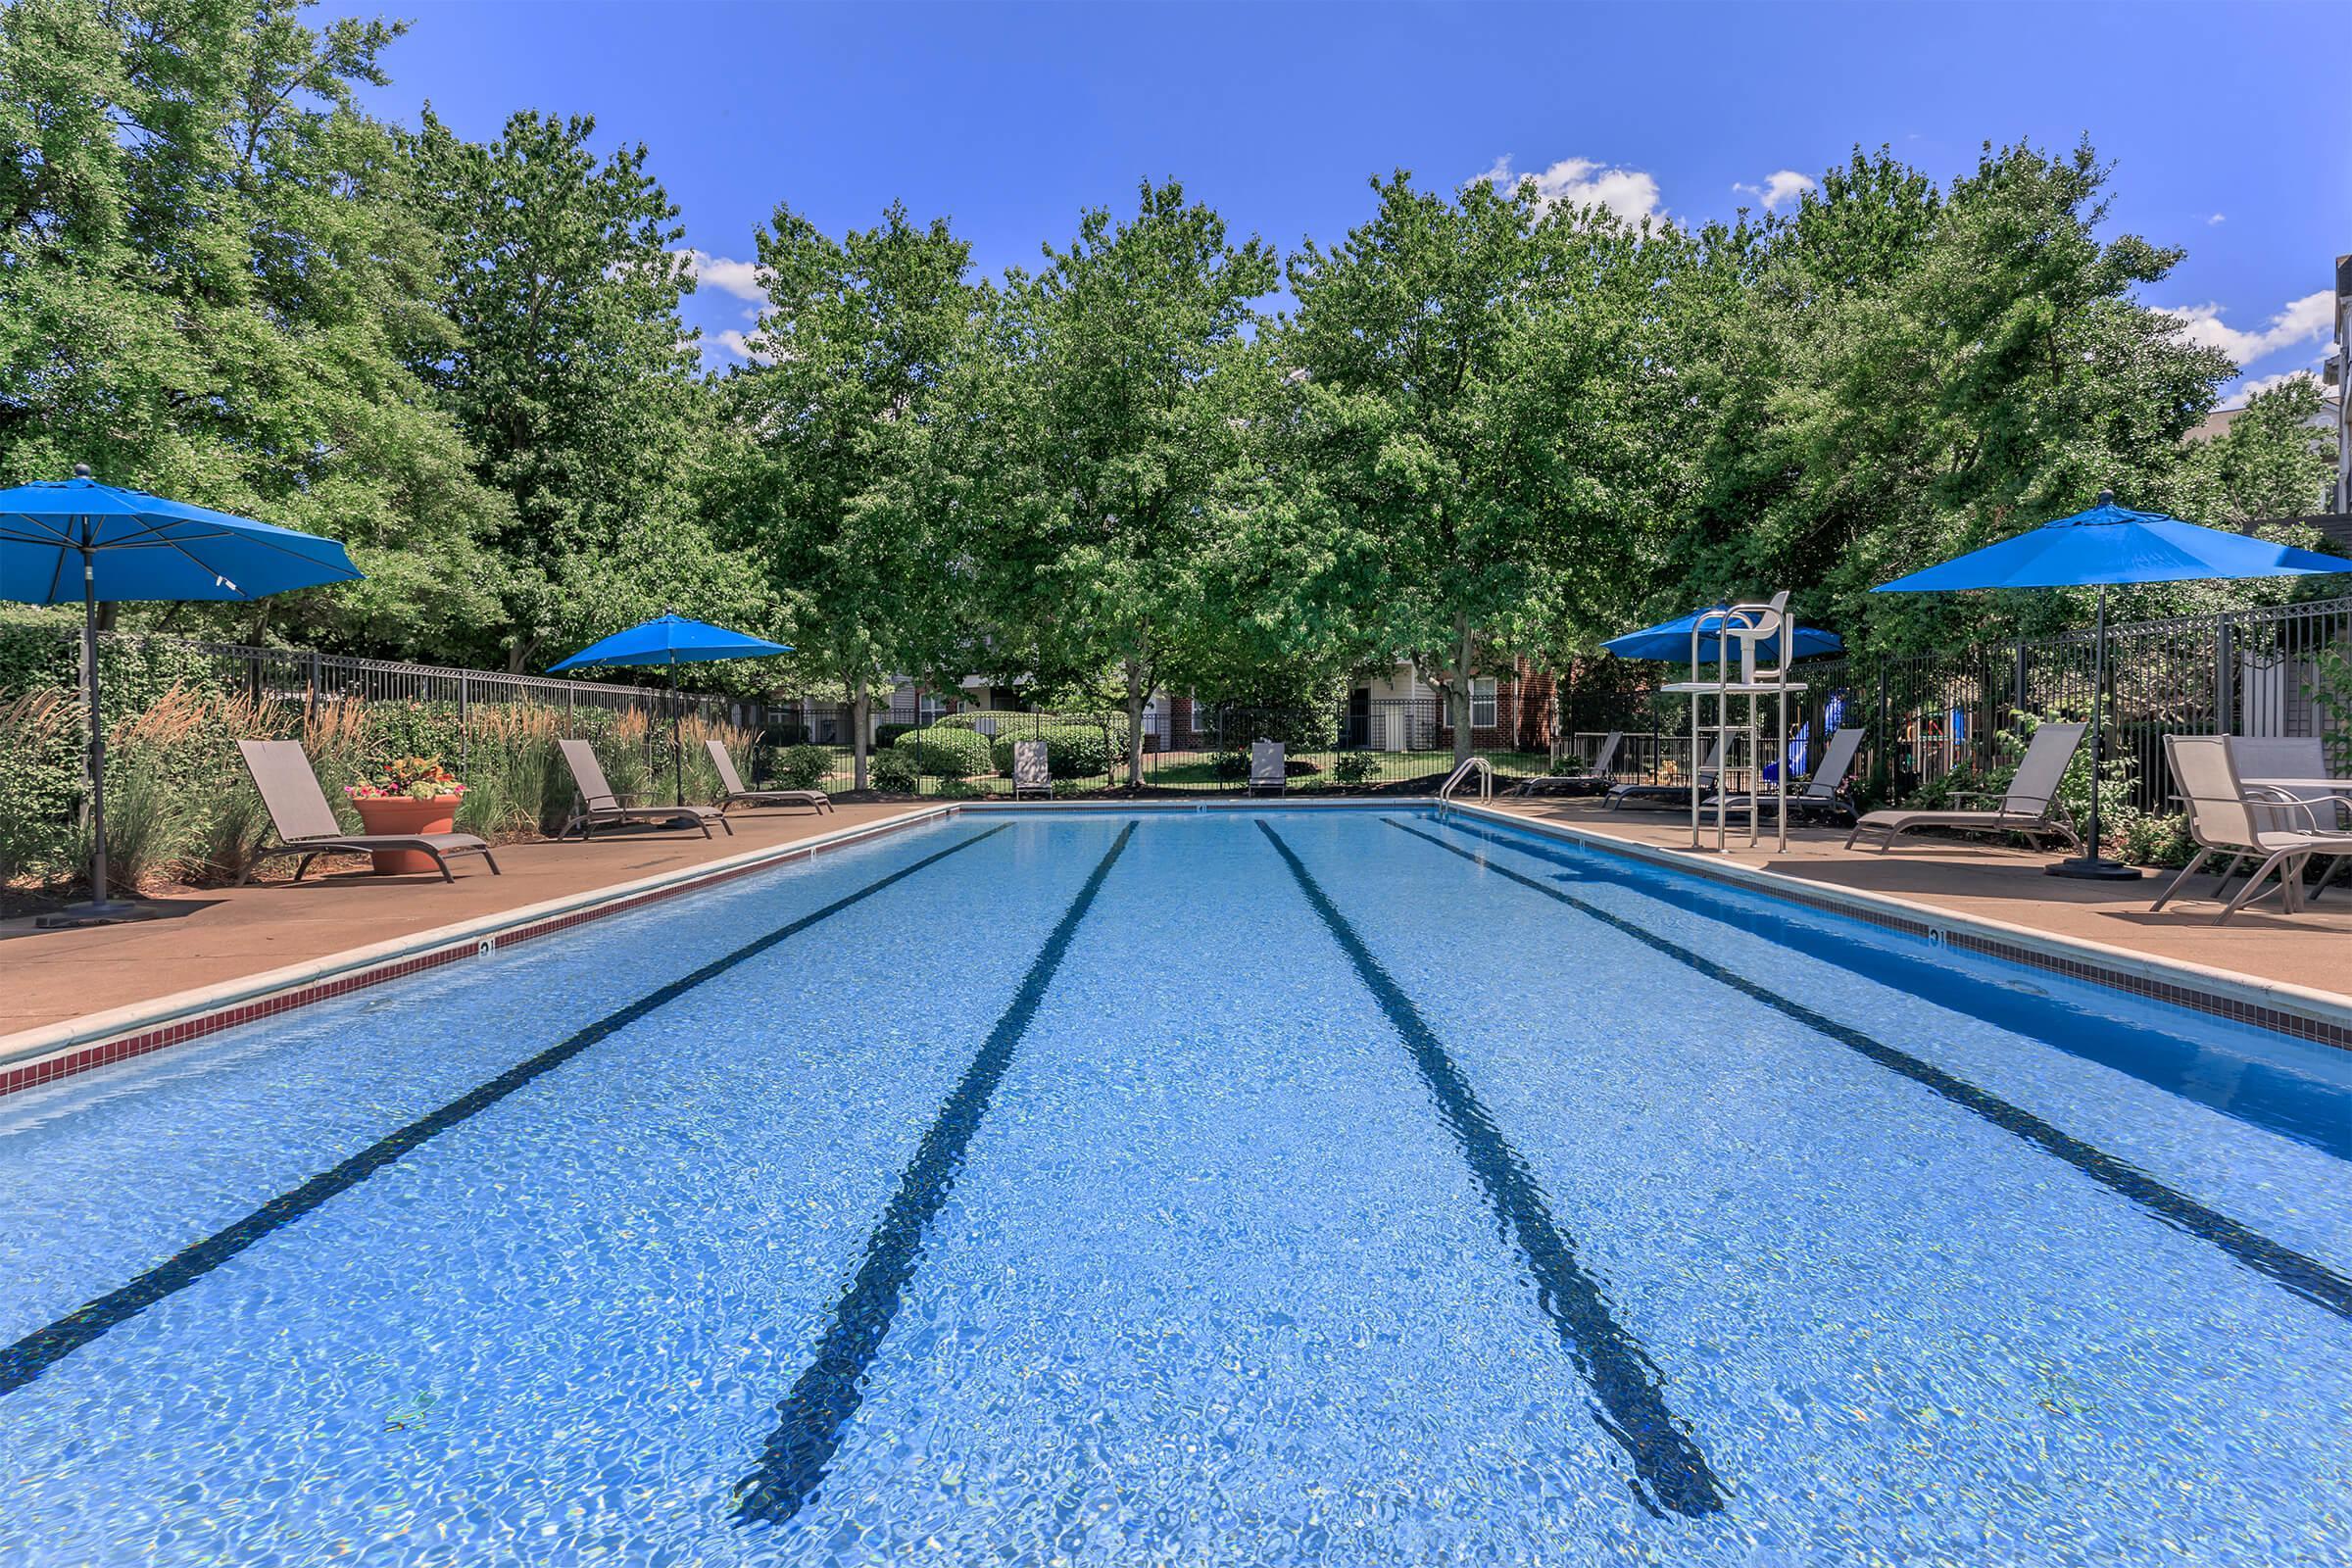 Pool at The Ridgeleigh at Van Dorn in Alexandria, VA